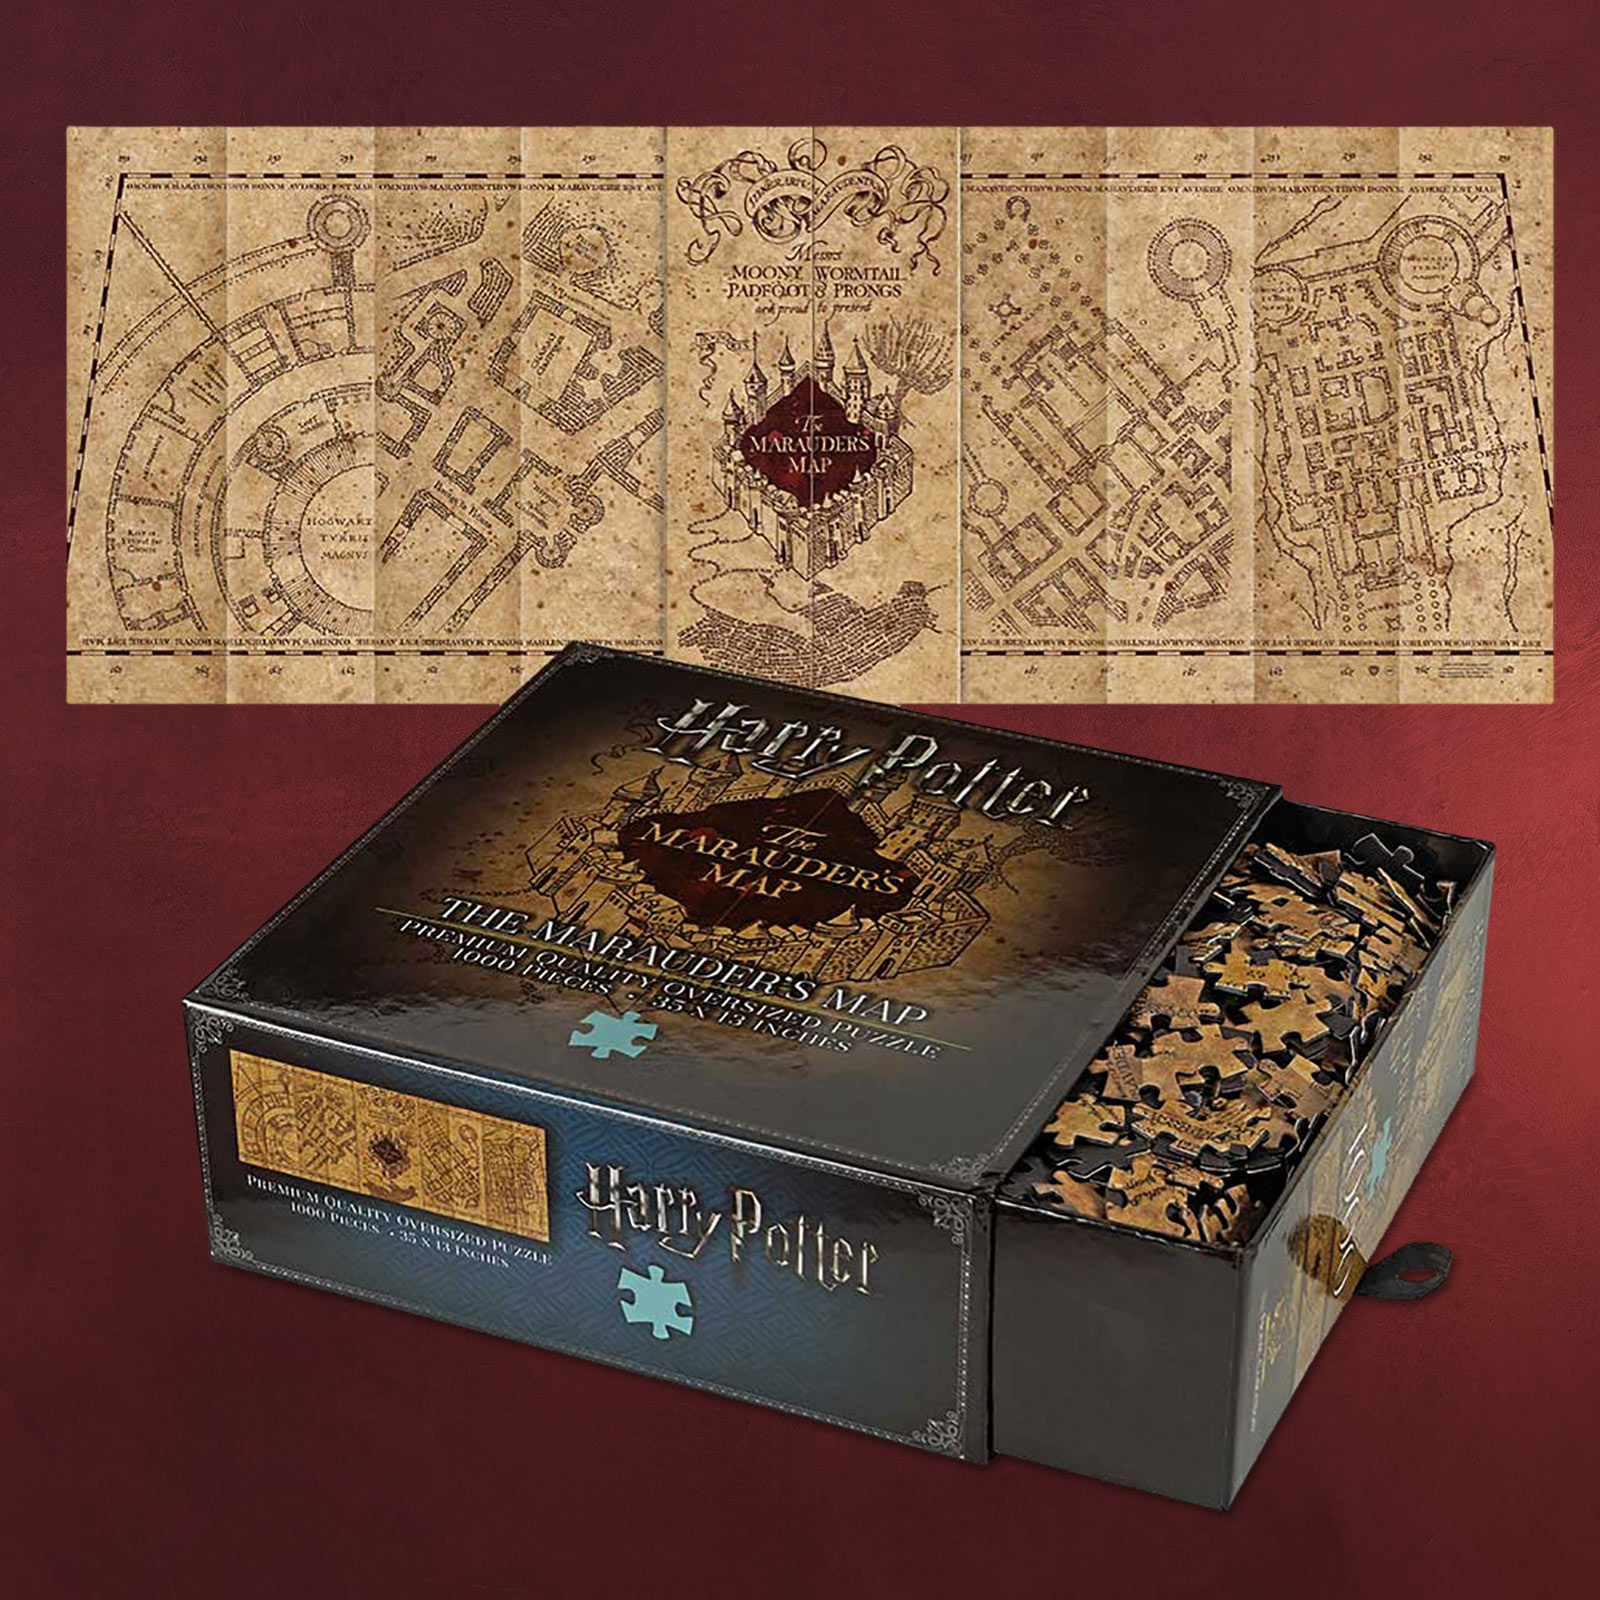 Karte Des Rumtreibers.Die Karte Des Rumtreibers Harry Potter Filmreplik Elbenwald